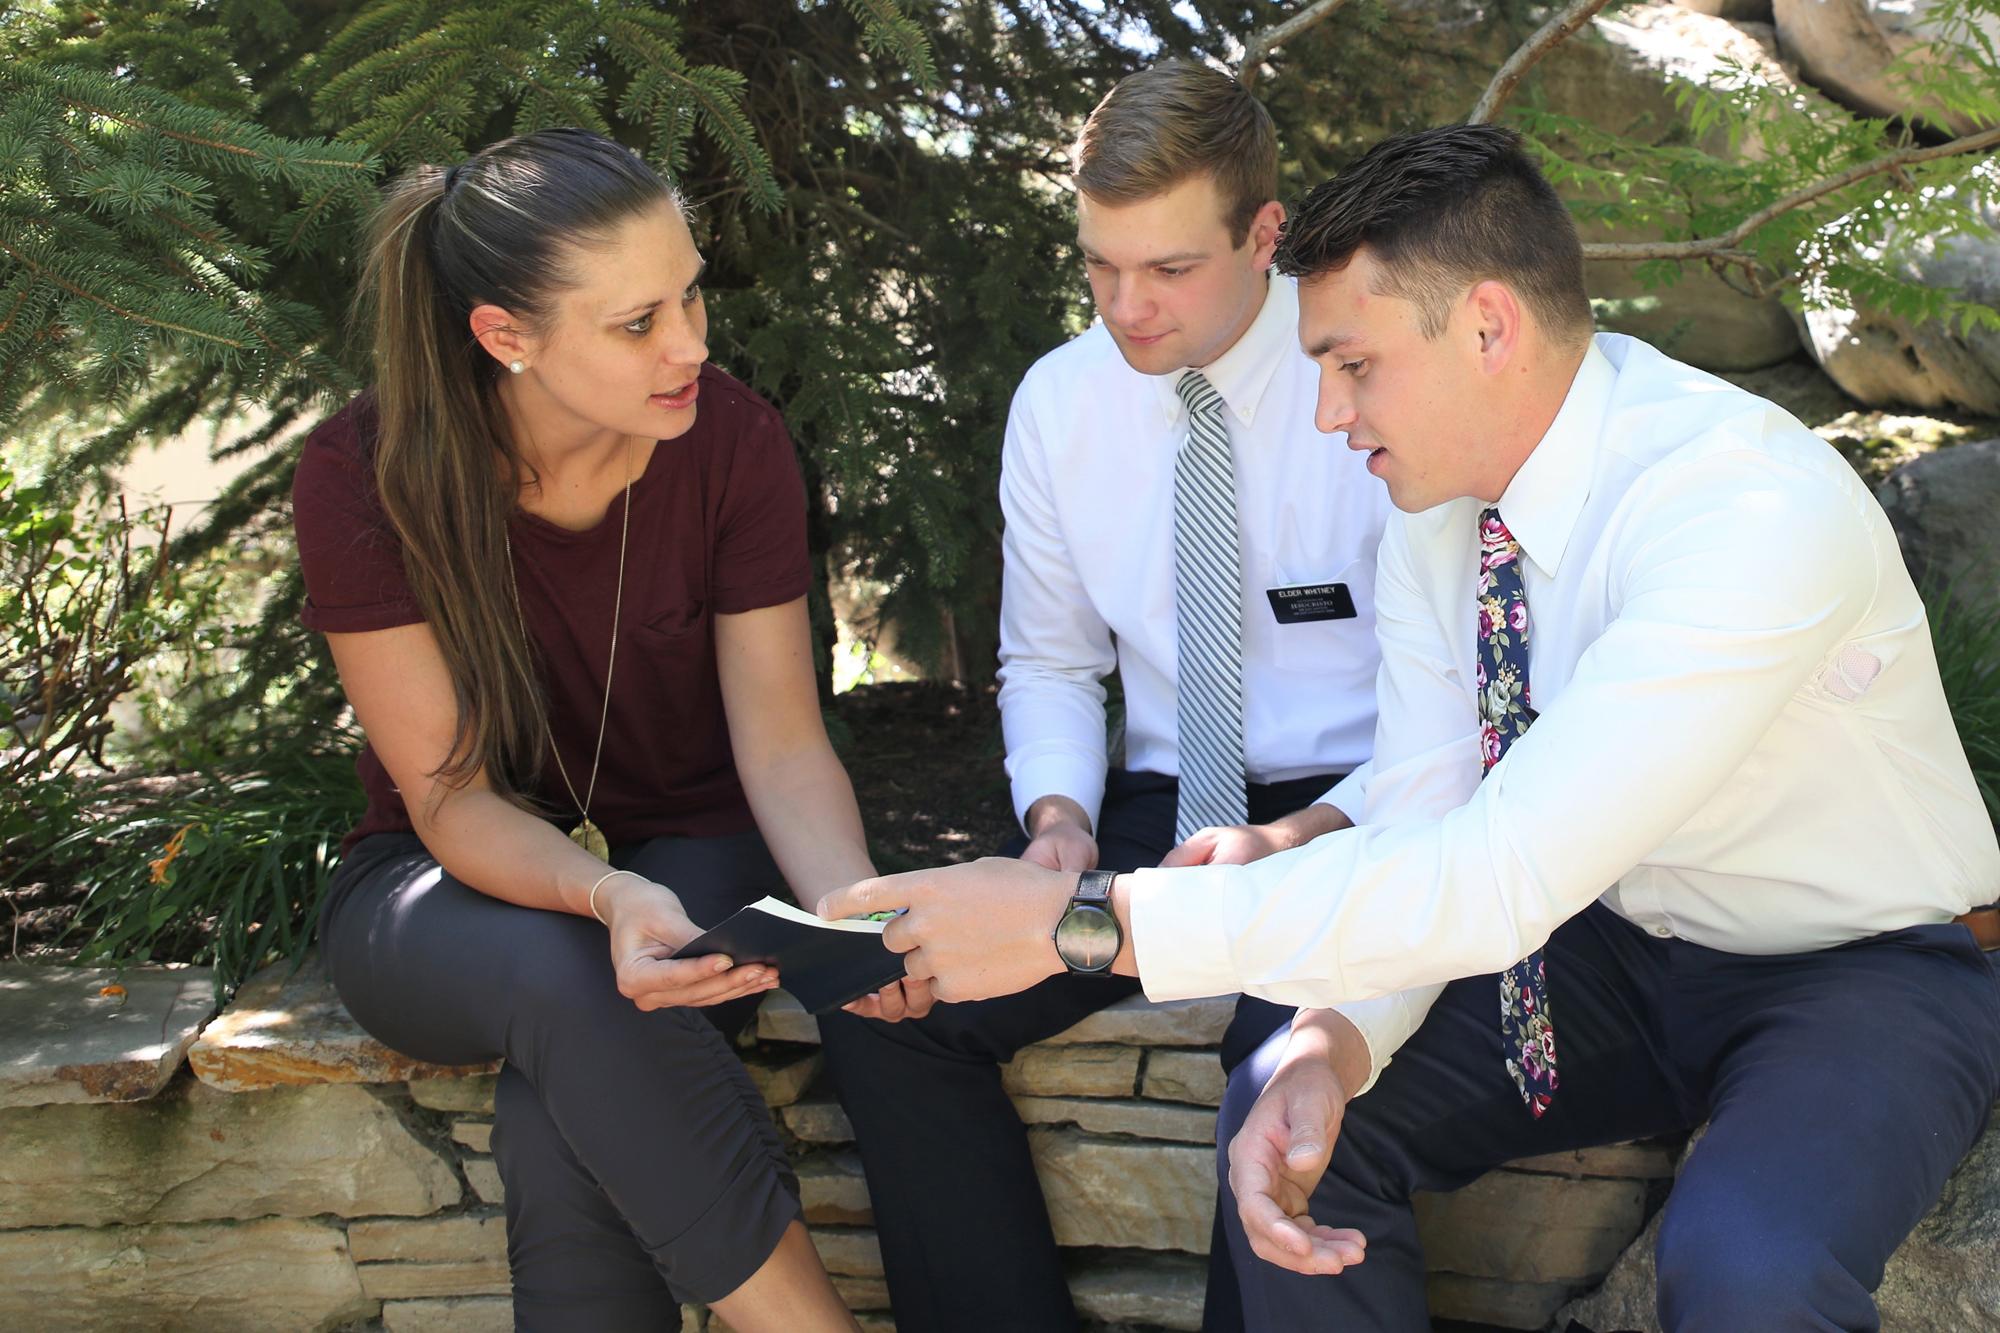 mormon-missionaries-teaching-woman_1508513528164.jpg